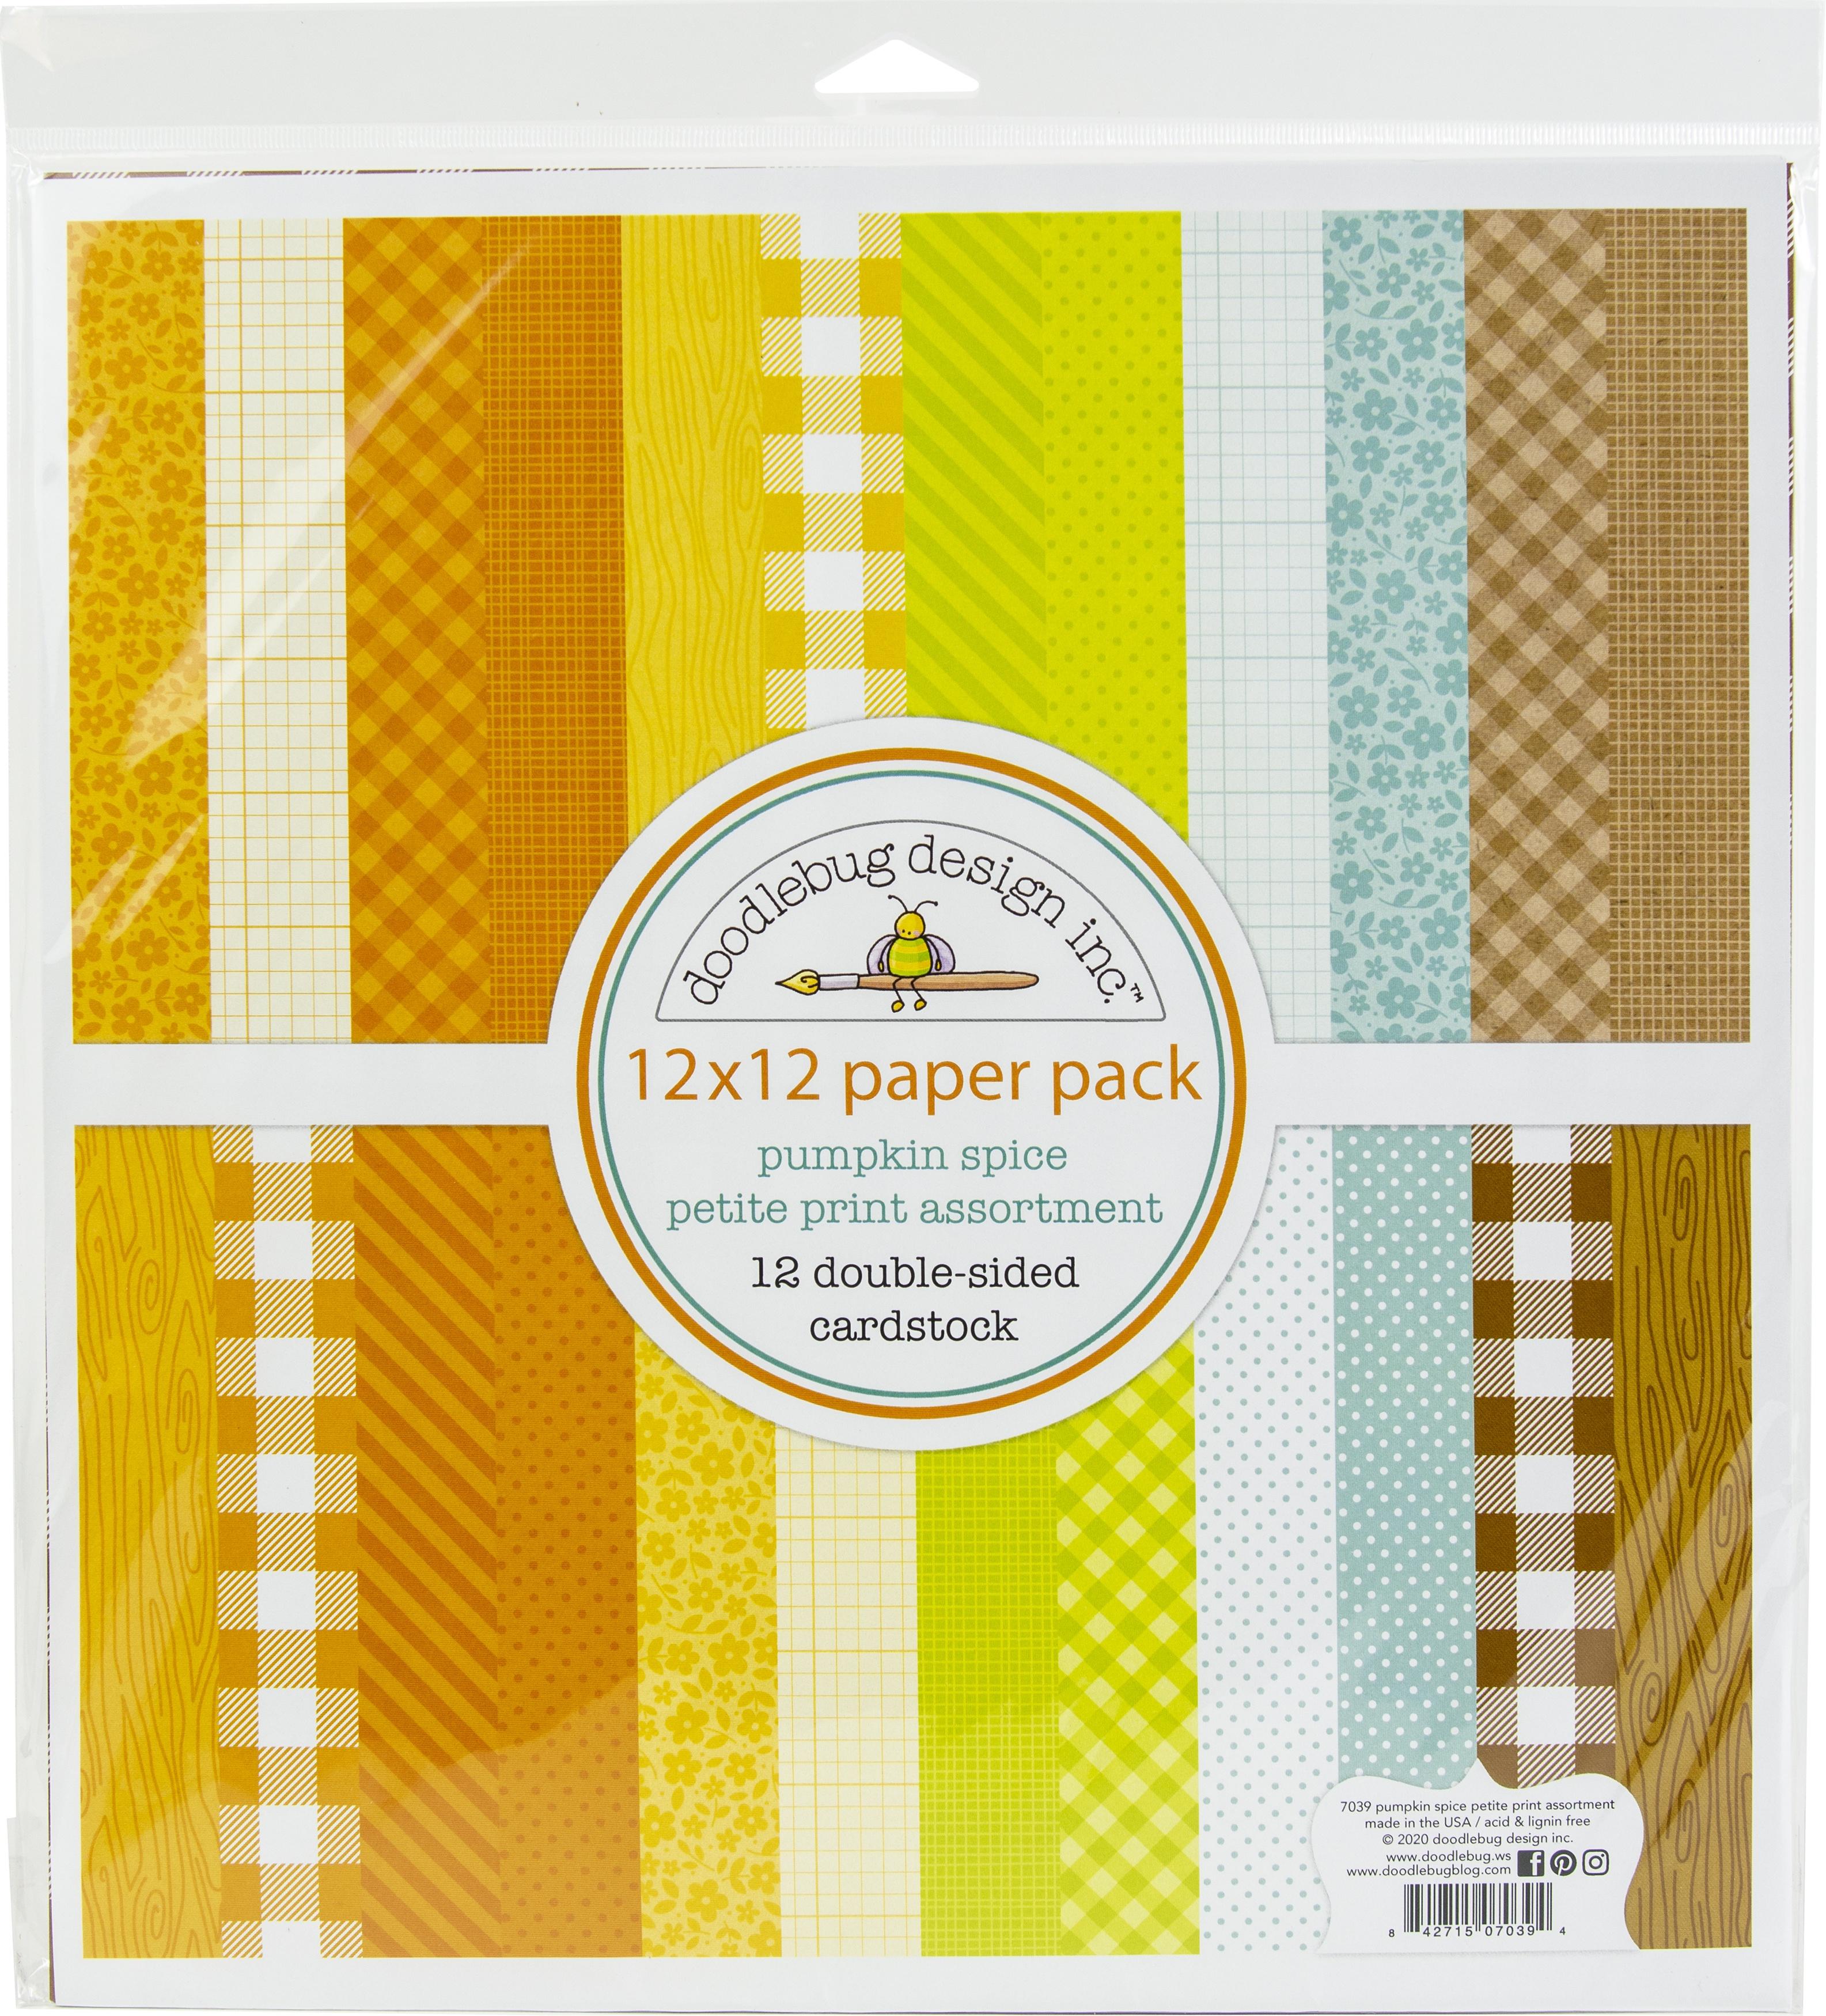 Doodlebug Petite Prints Double-Sided Cardstock 12X12 12/Pk-Pumpkin Spice, 12 D...